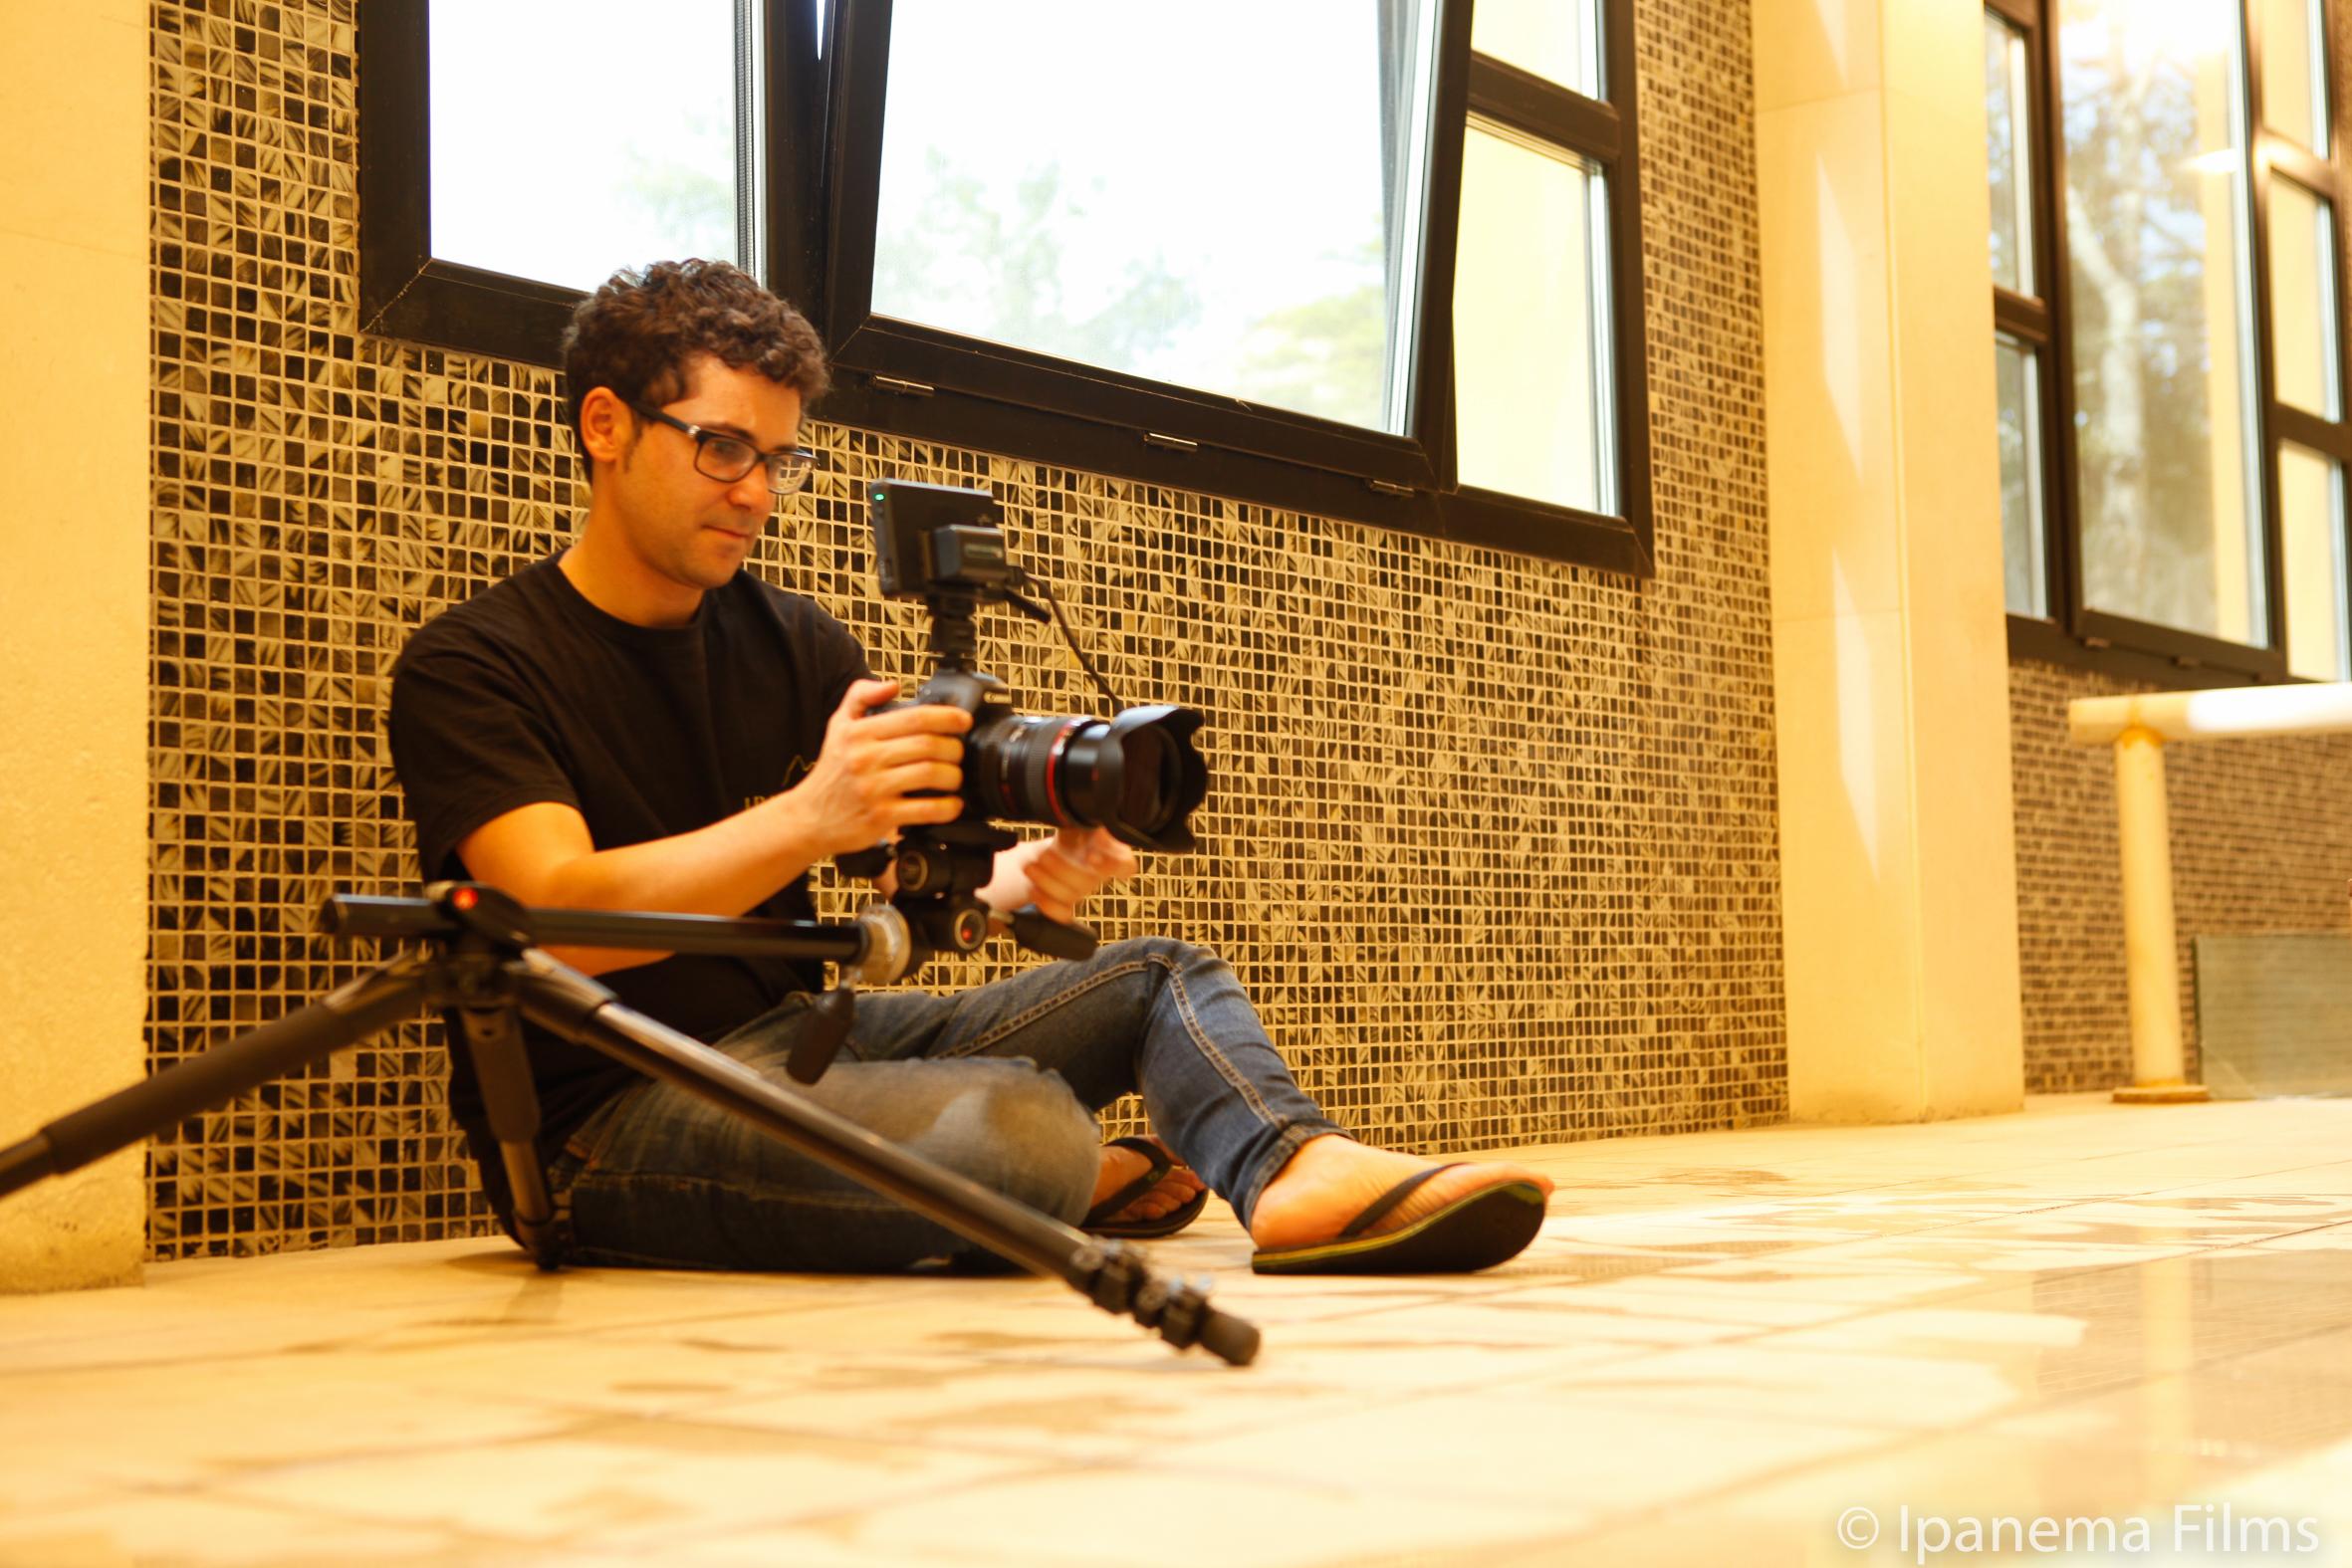 Ipanema Films-13